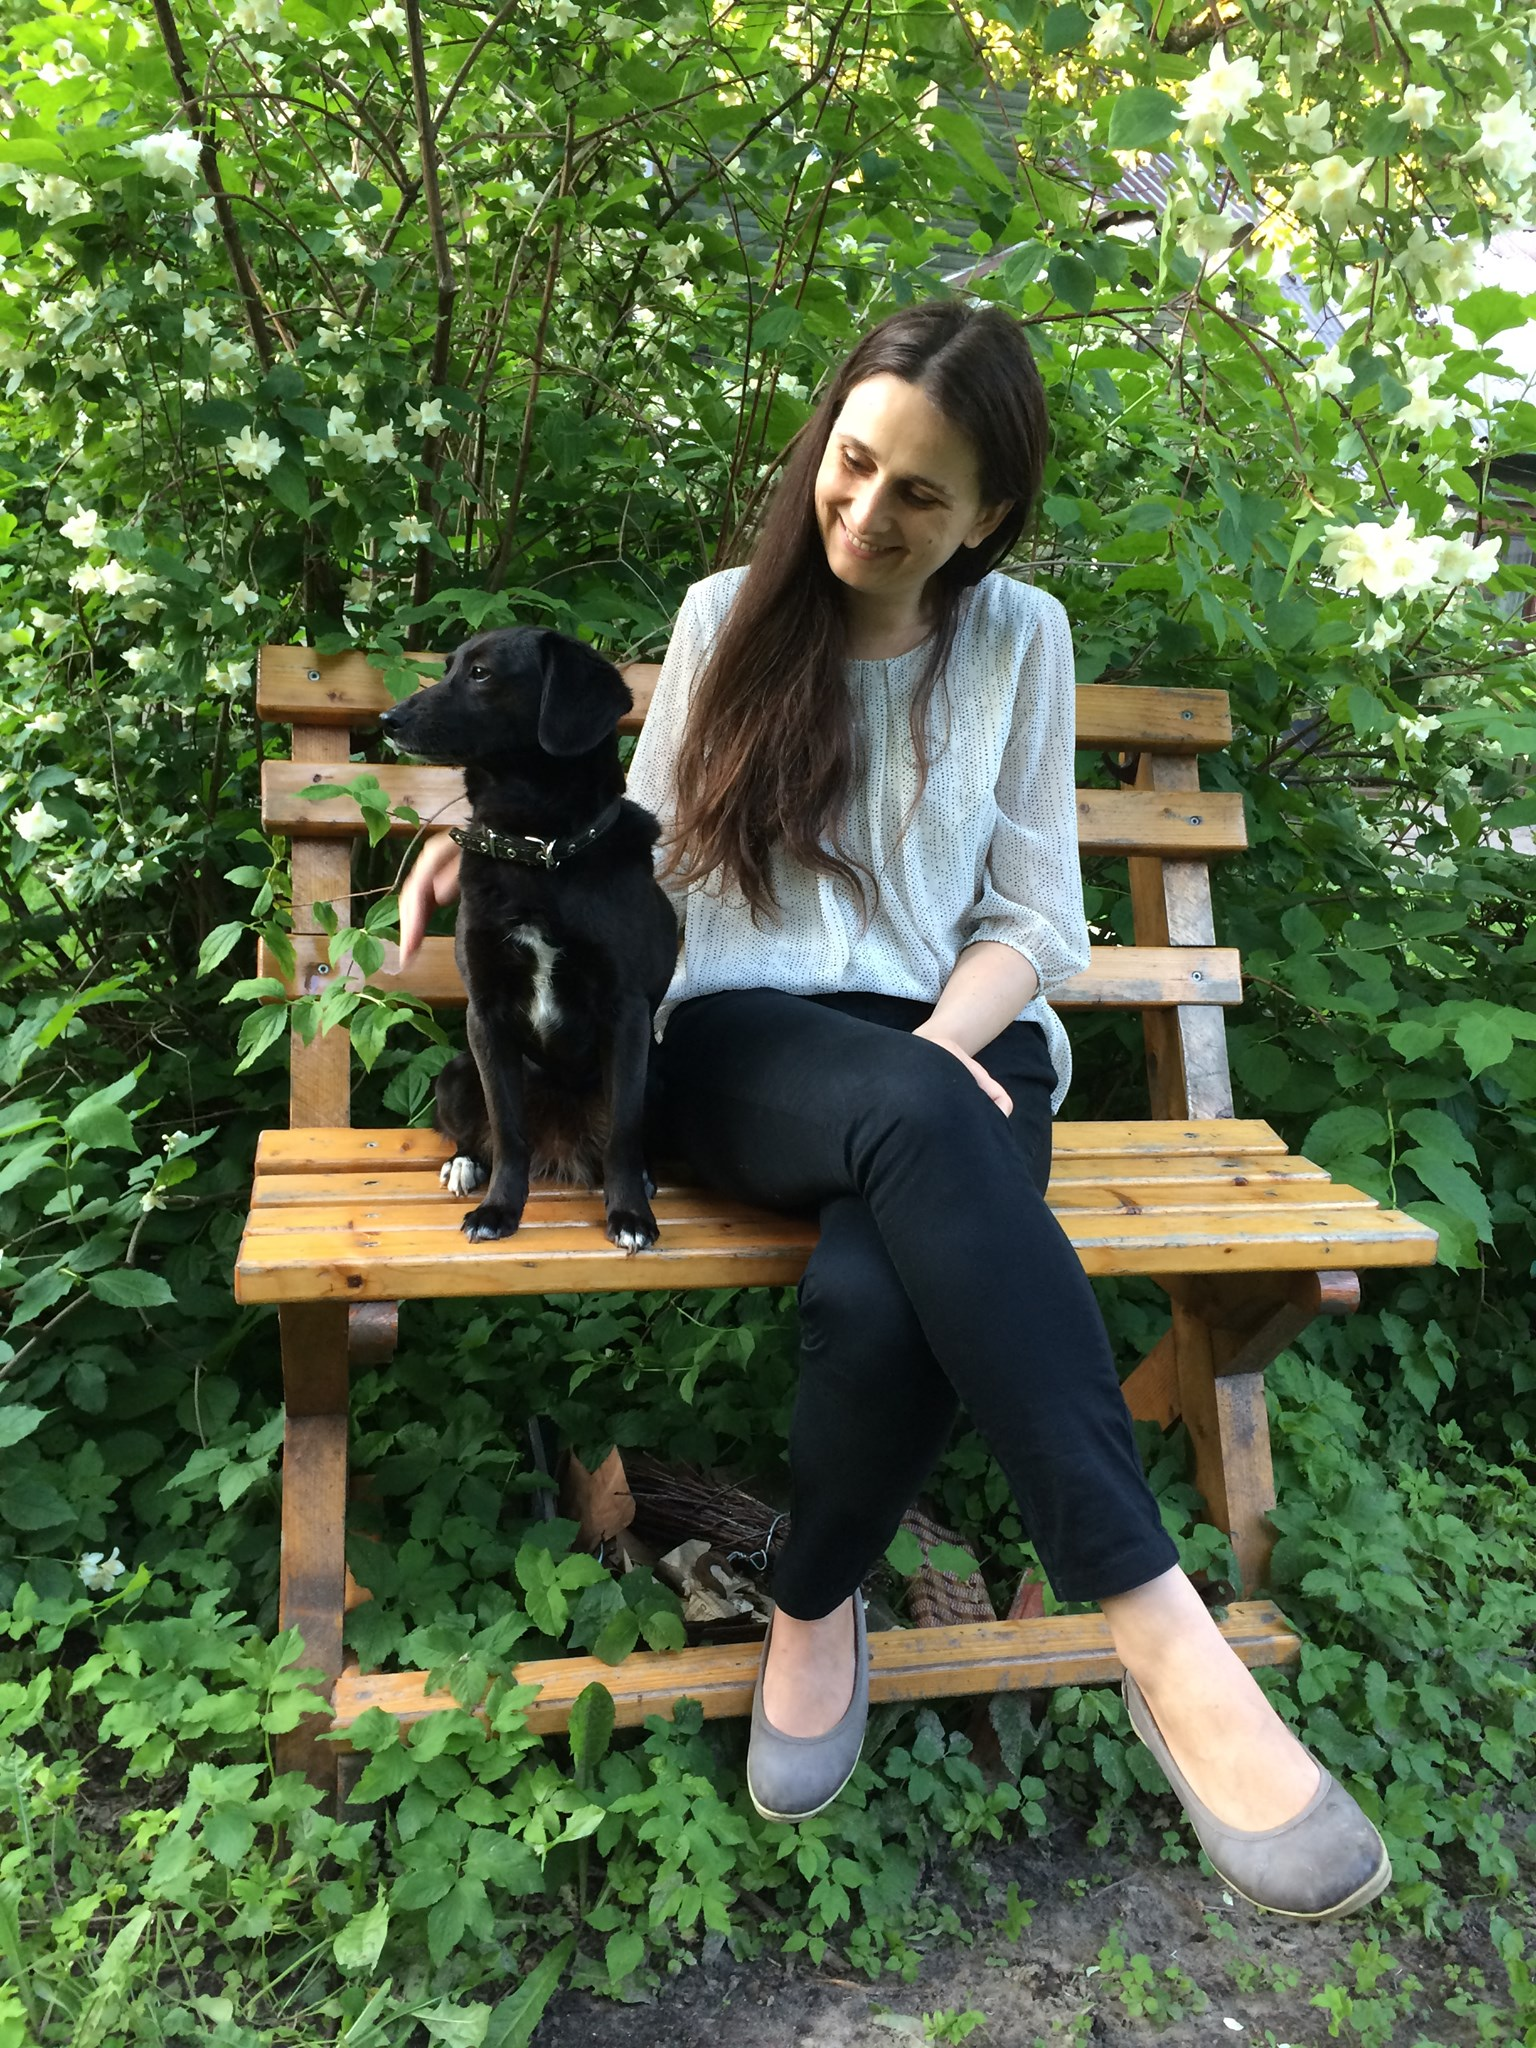 Ant suoliuko sėdi mergina su mažu juodu šuniuku